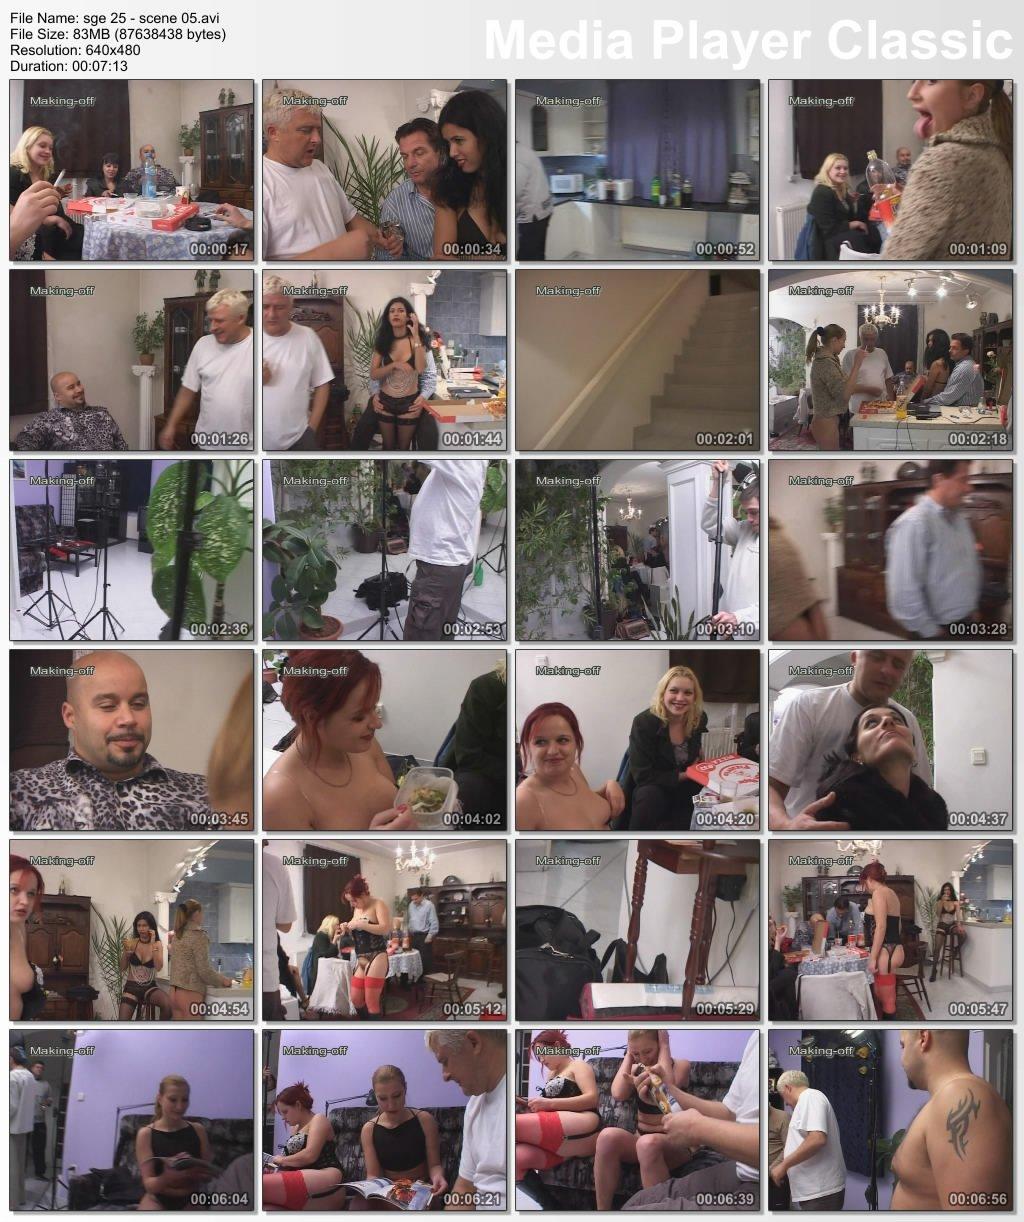 Sperrgebiet Erotik 25 - FULL MOVIE (Silvia, Natasha, Linda, Tima, Reda, Oxana and Roland) - Scene 5